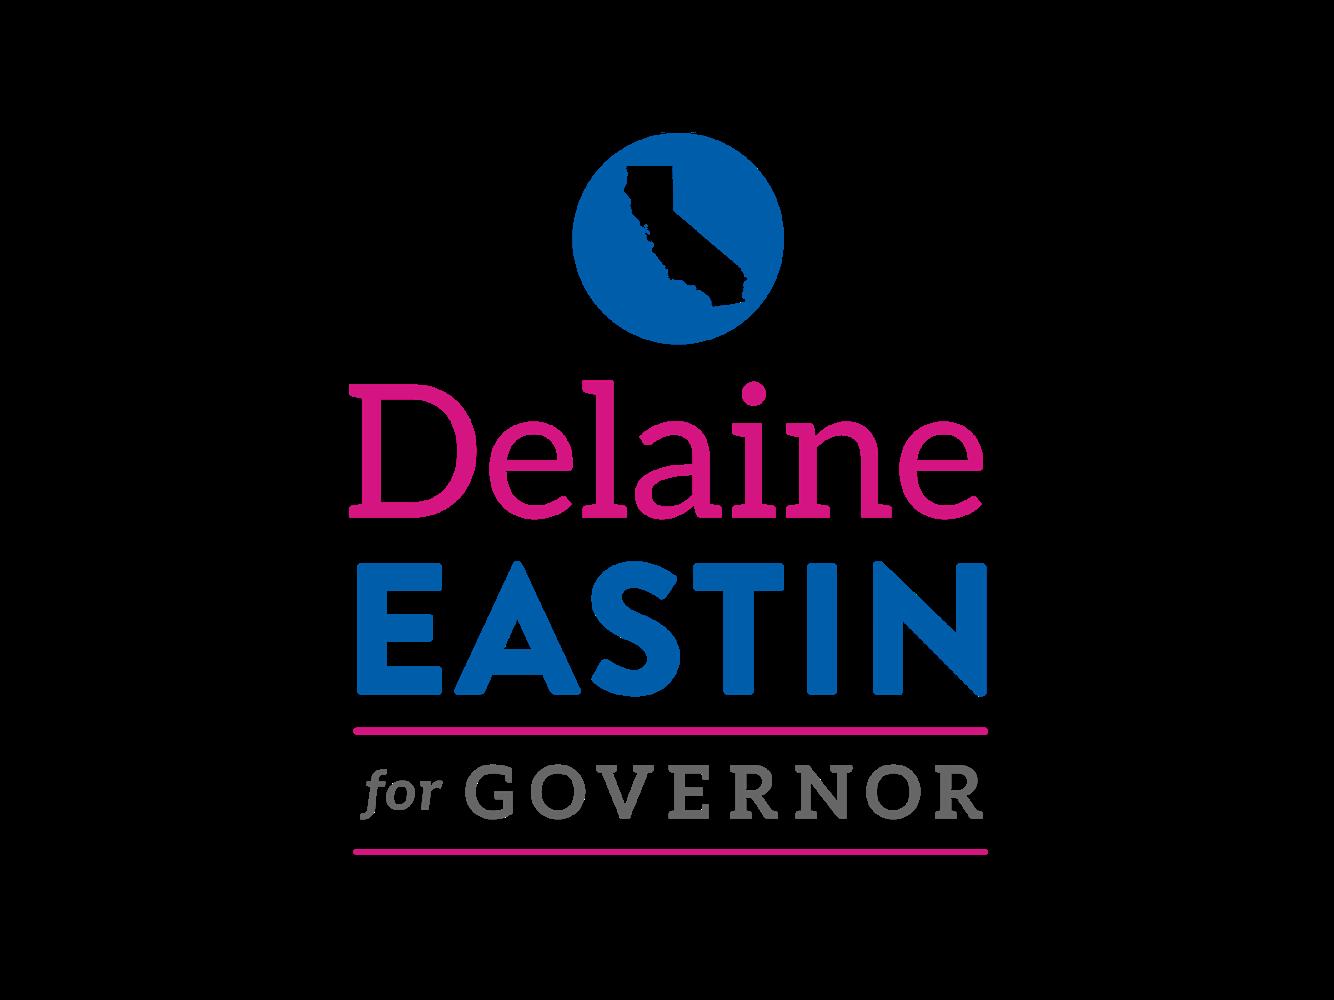 Delaine Eastin for Governor